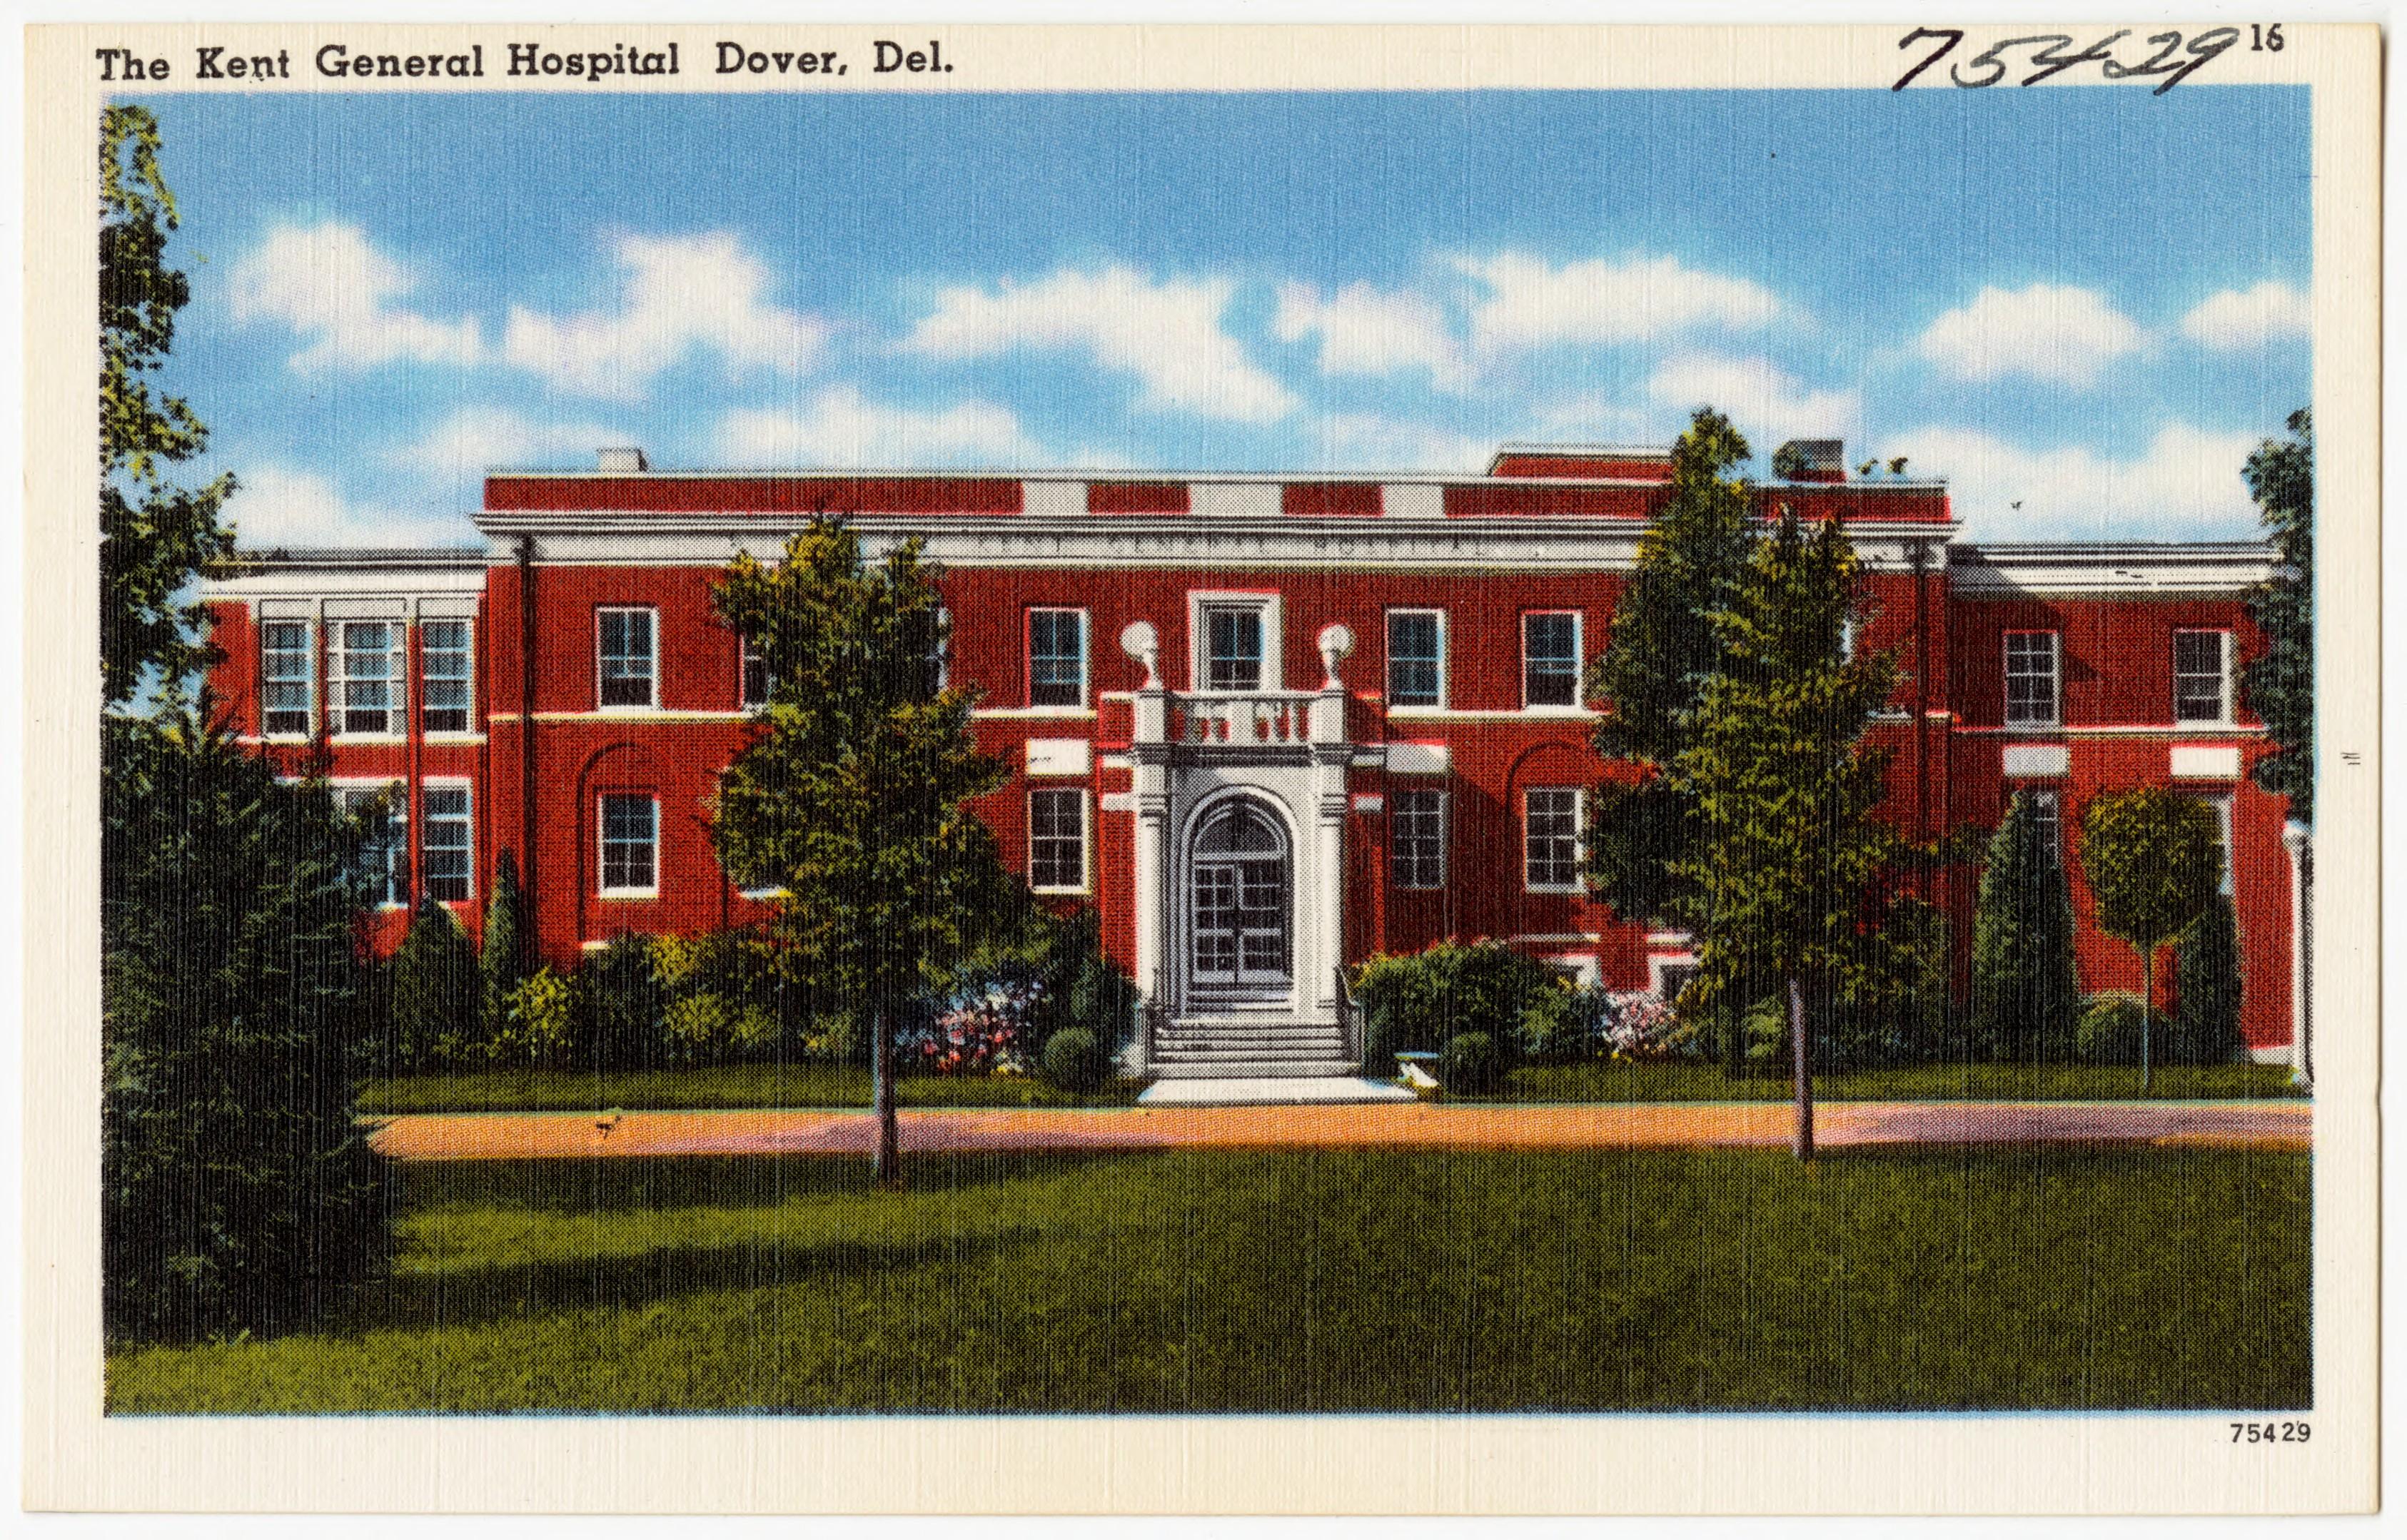 Kent General Hospital logo